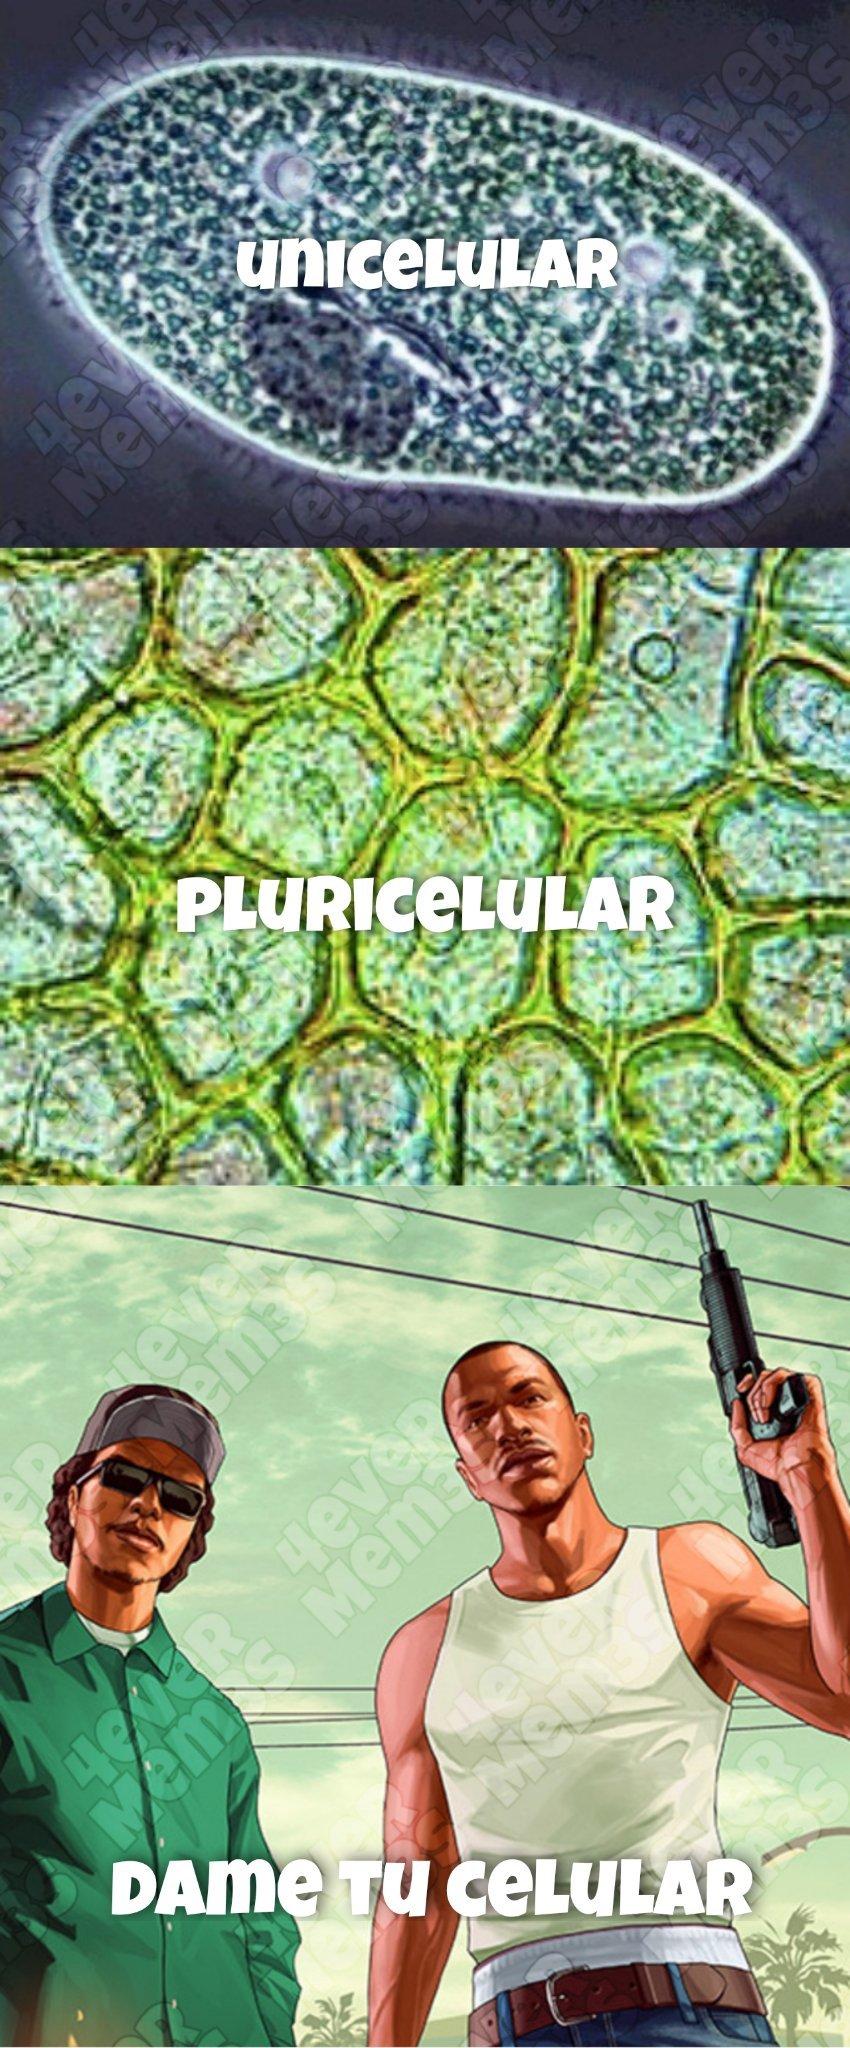 Dametucelular - meme